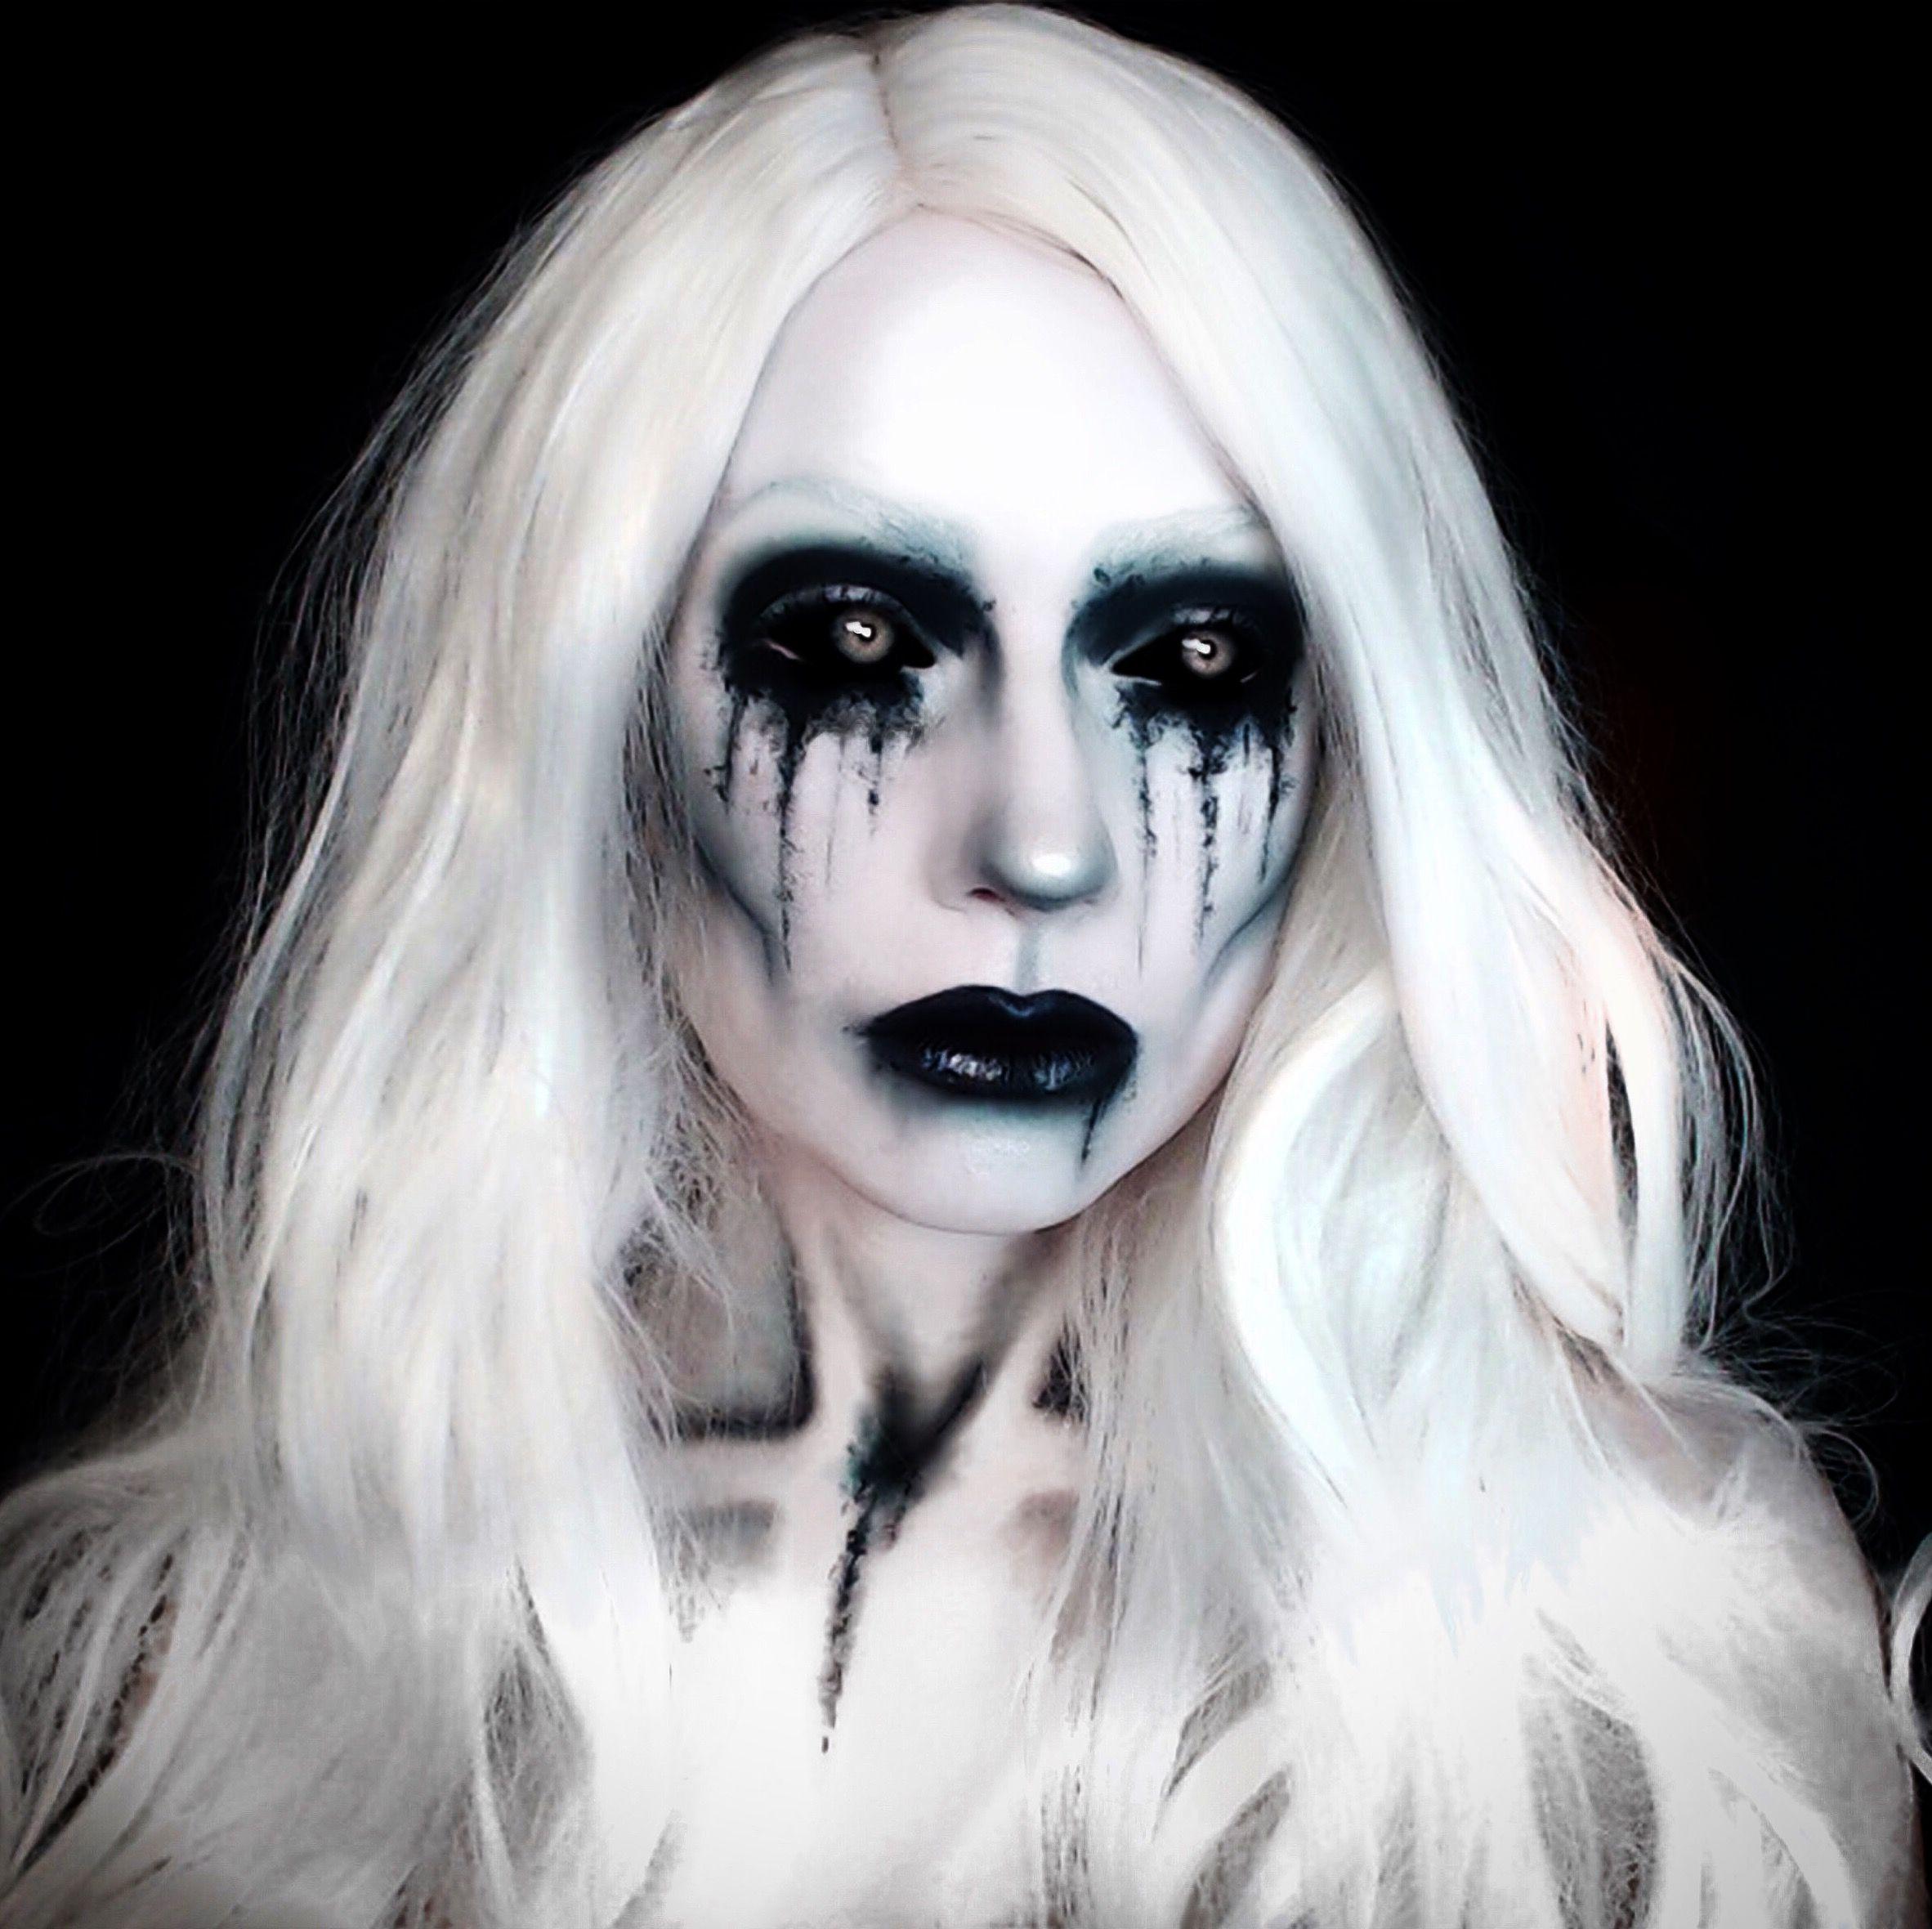 La Llorona Ghost Horror Creepy Makeup Black And White